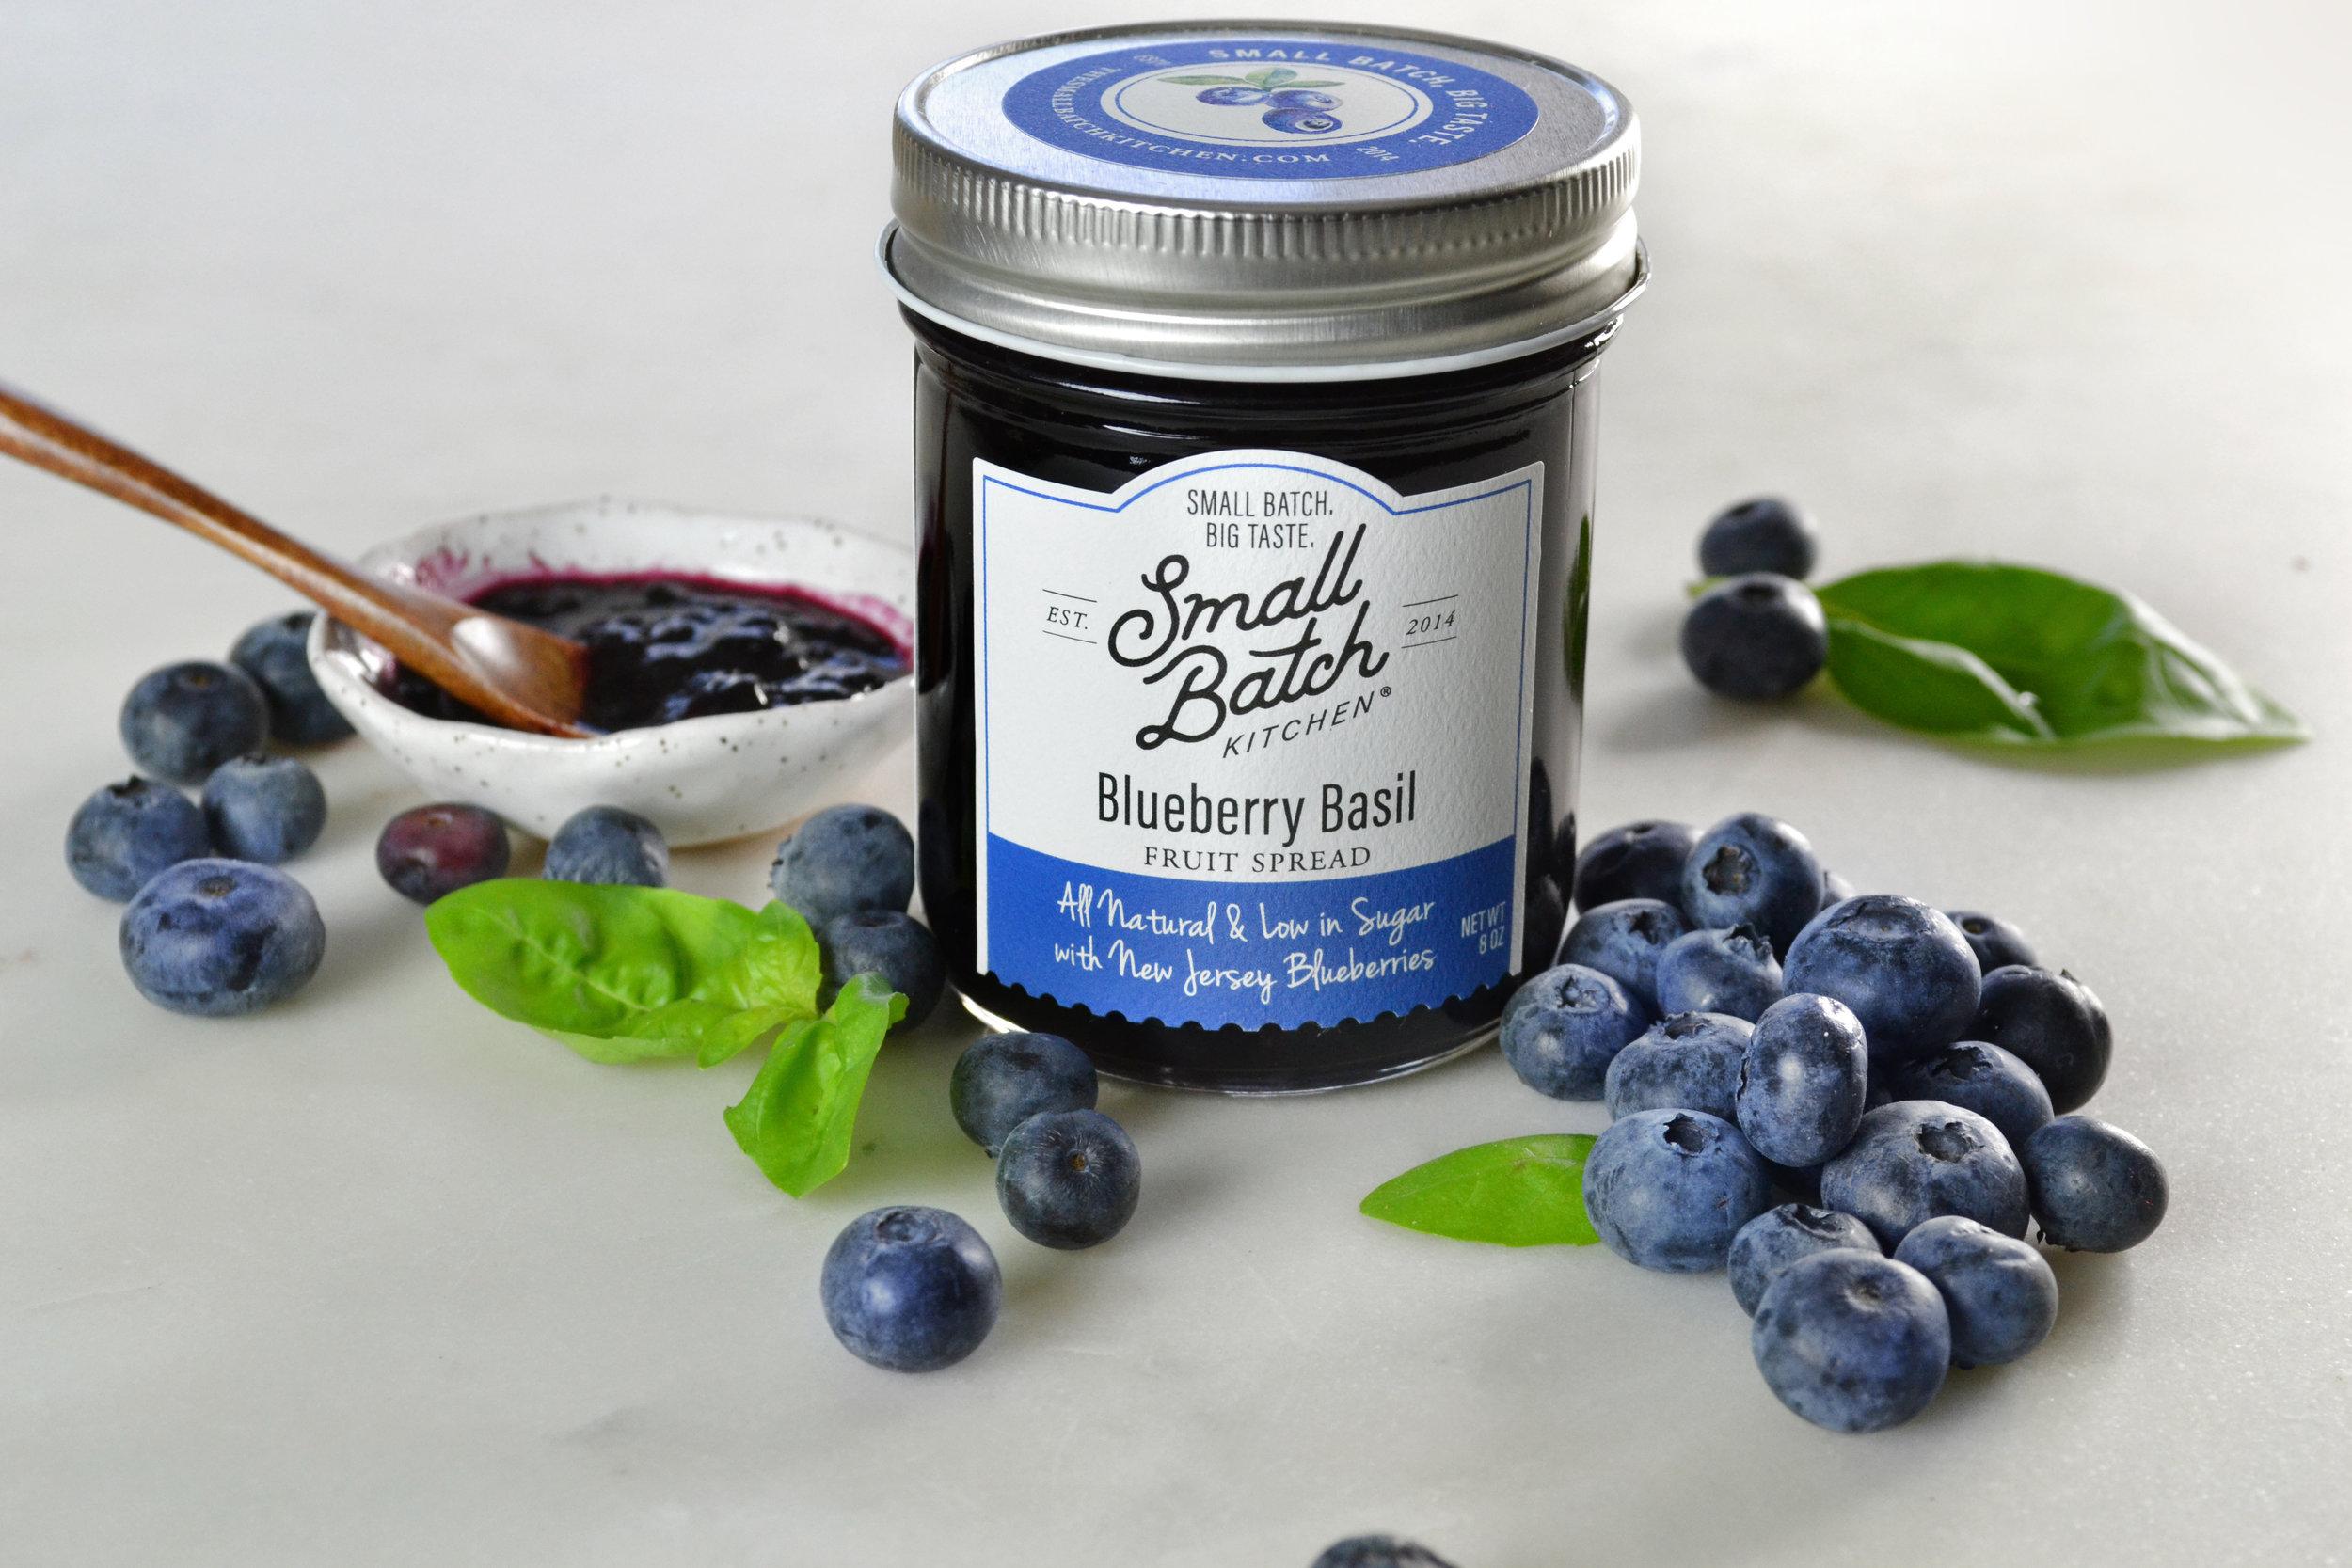 Blueberry Basil Fruit Spread